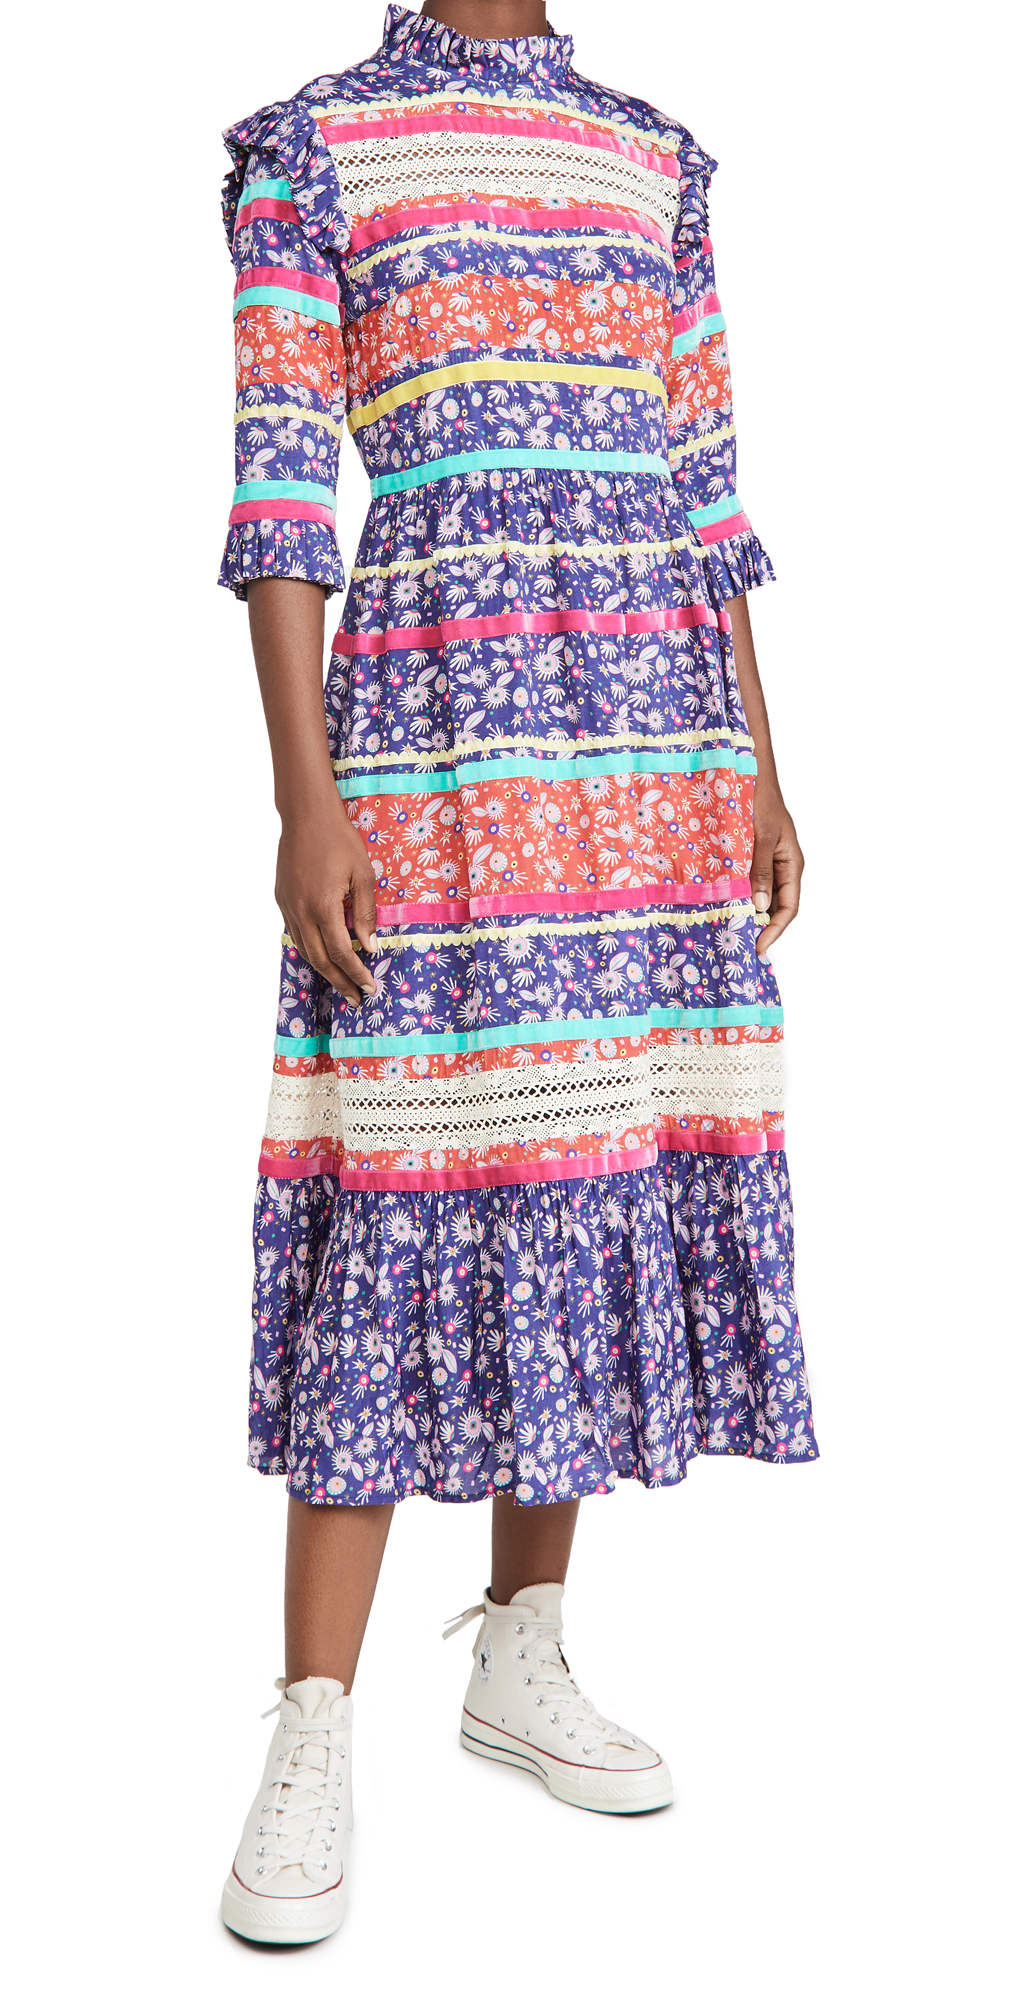 CeliaB Charlotte Dress